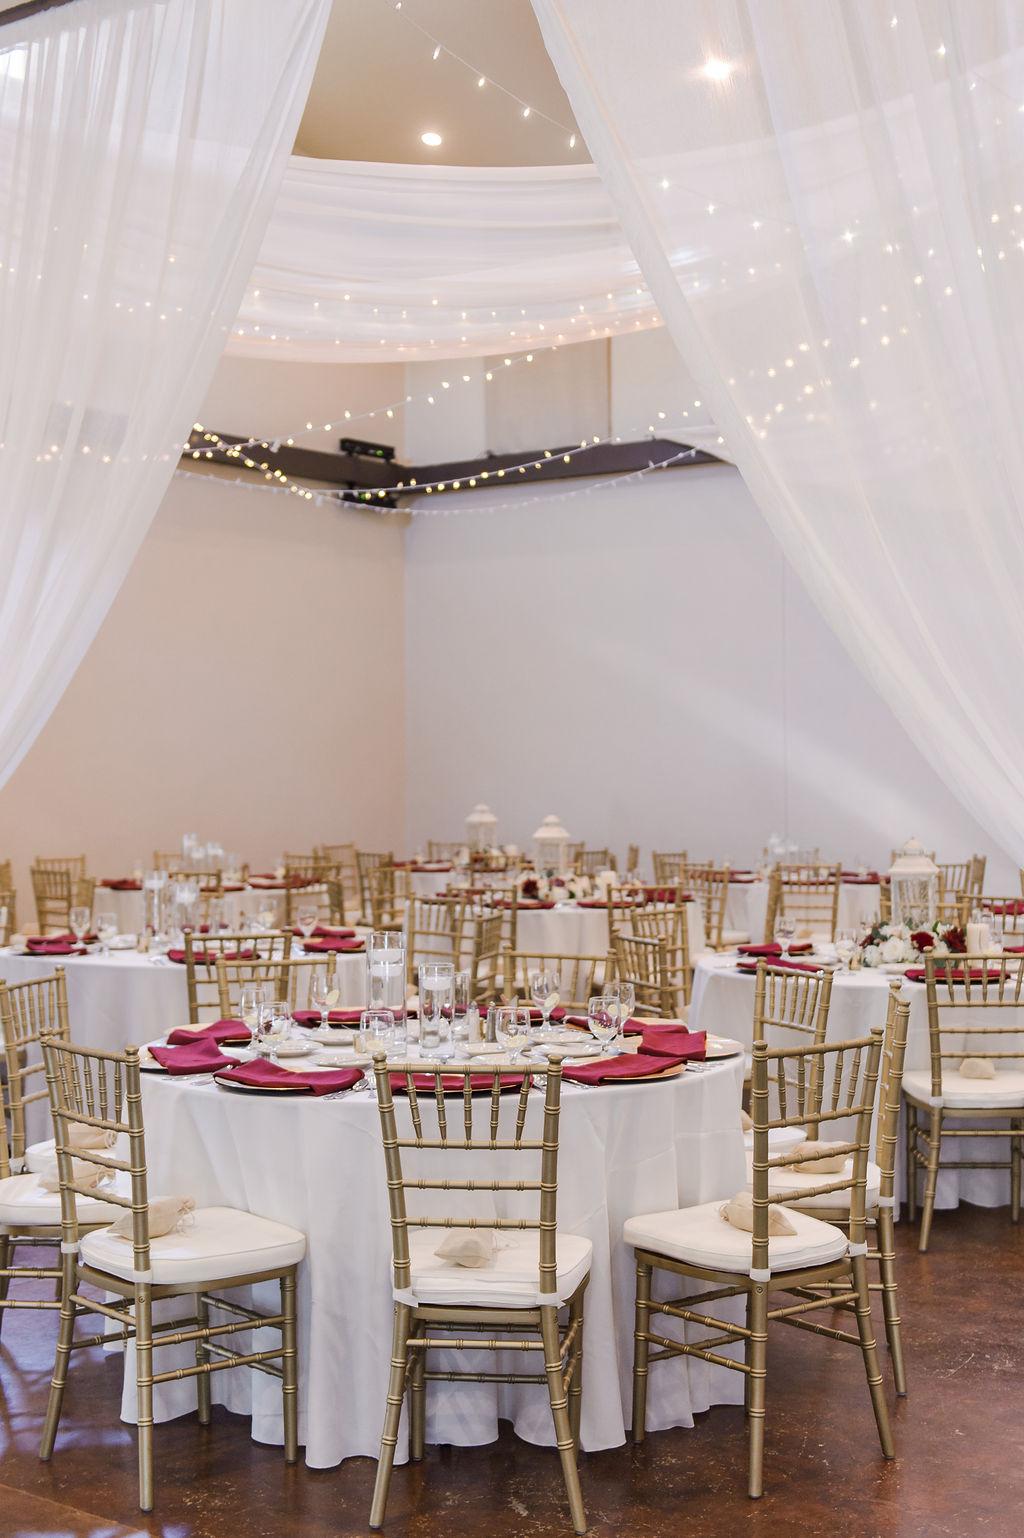 BakersRanch All Inclusive Wedding (30).jpg